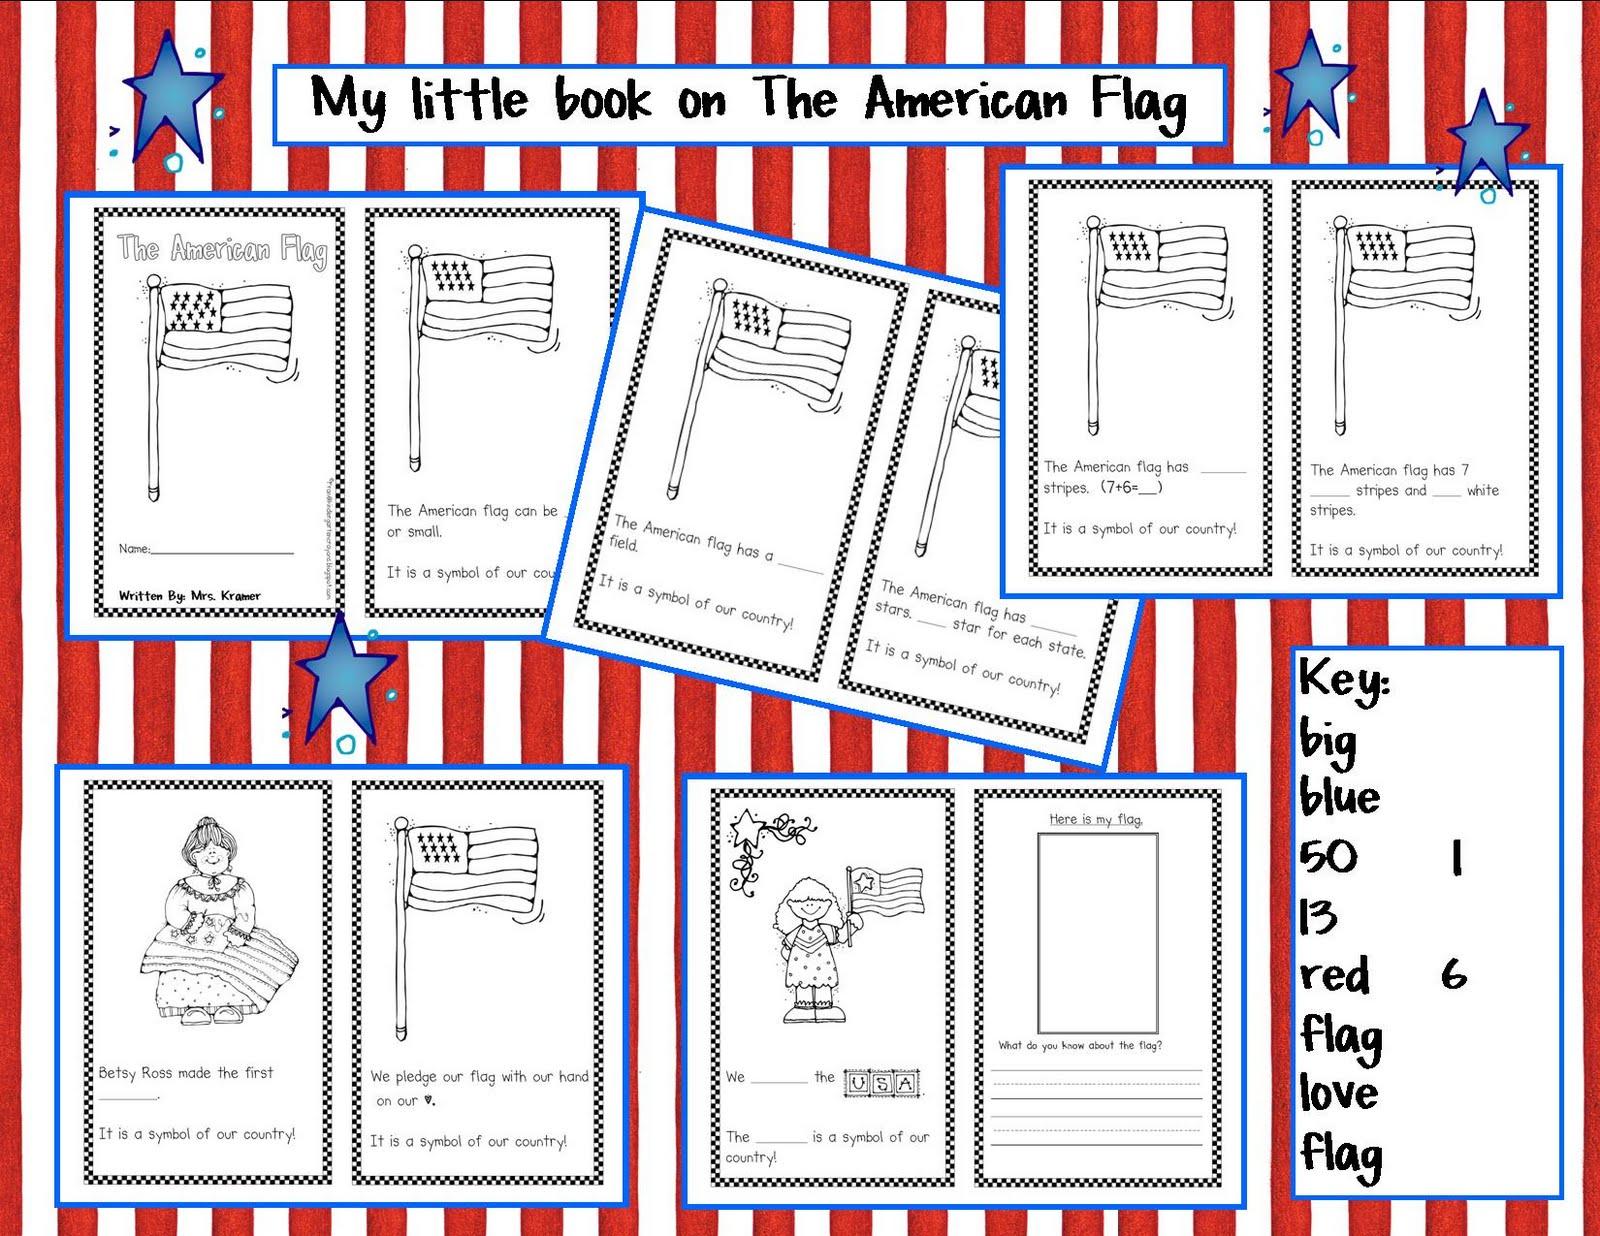 Kindergarten Crayons Have You Pledged Today